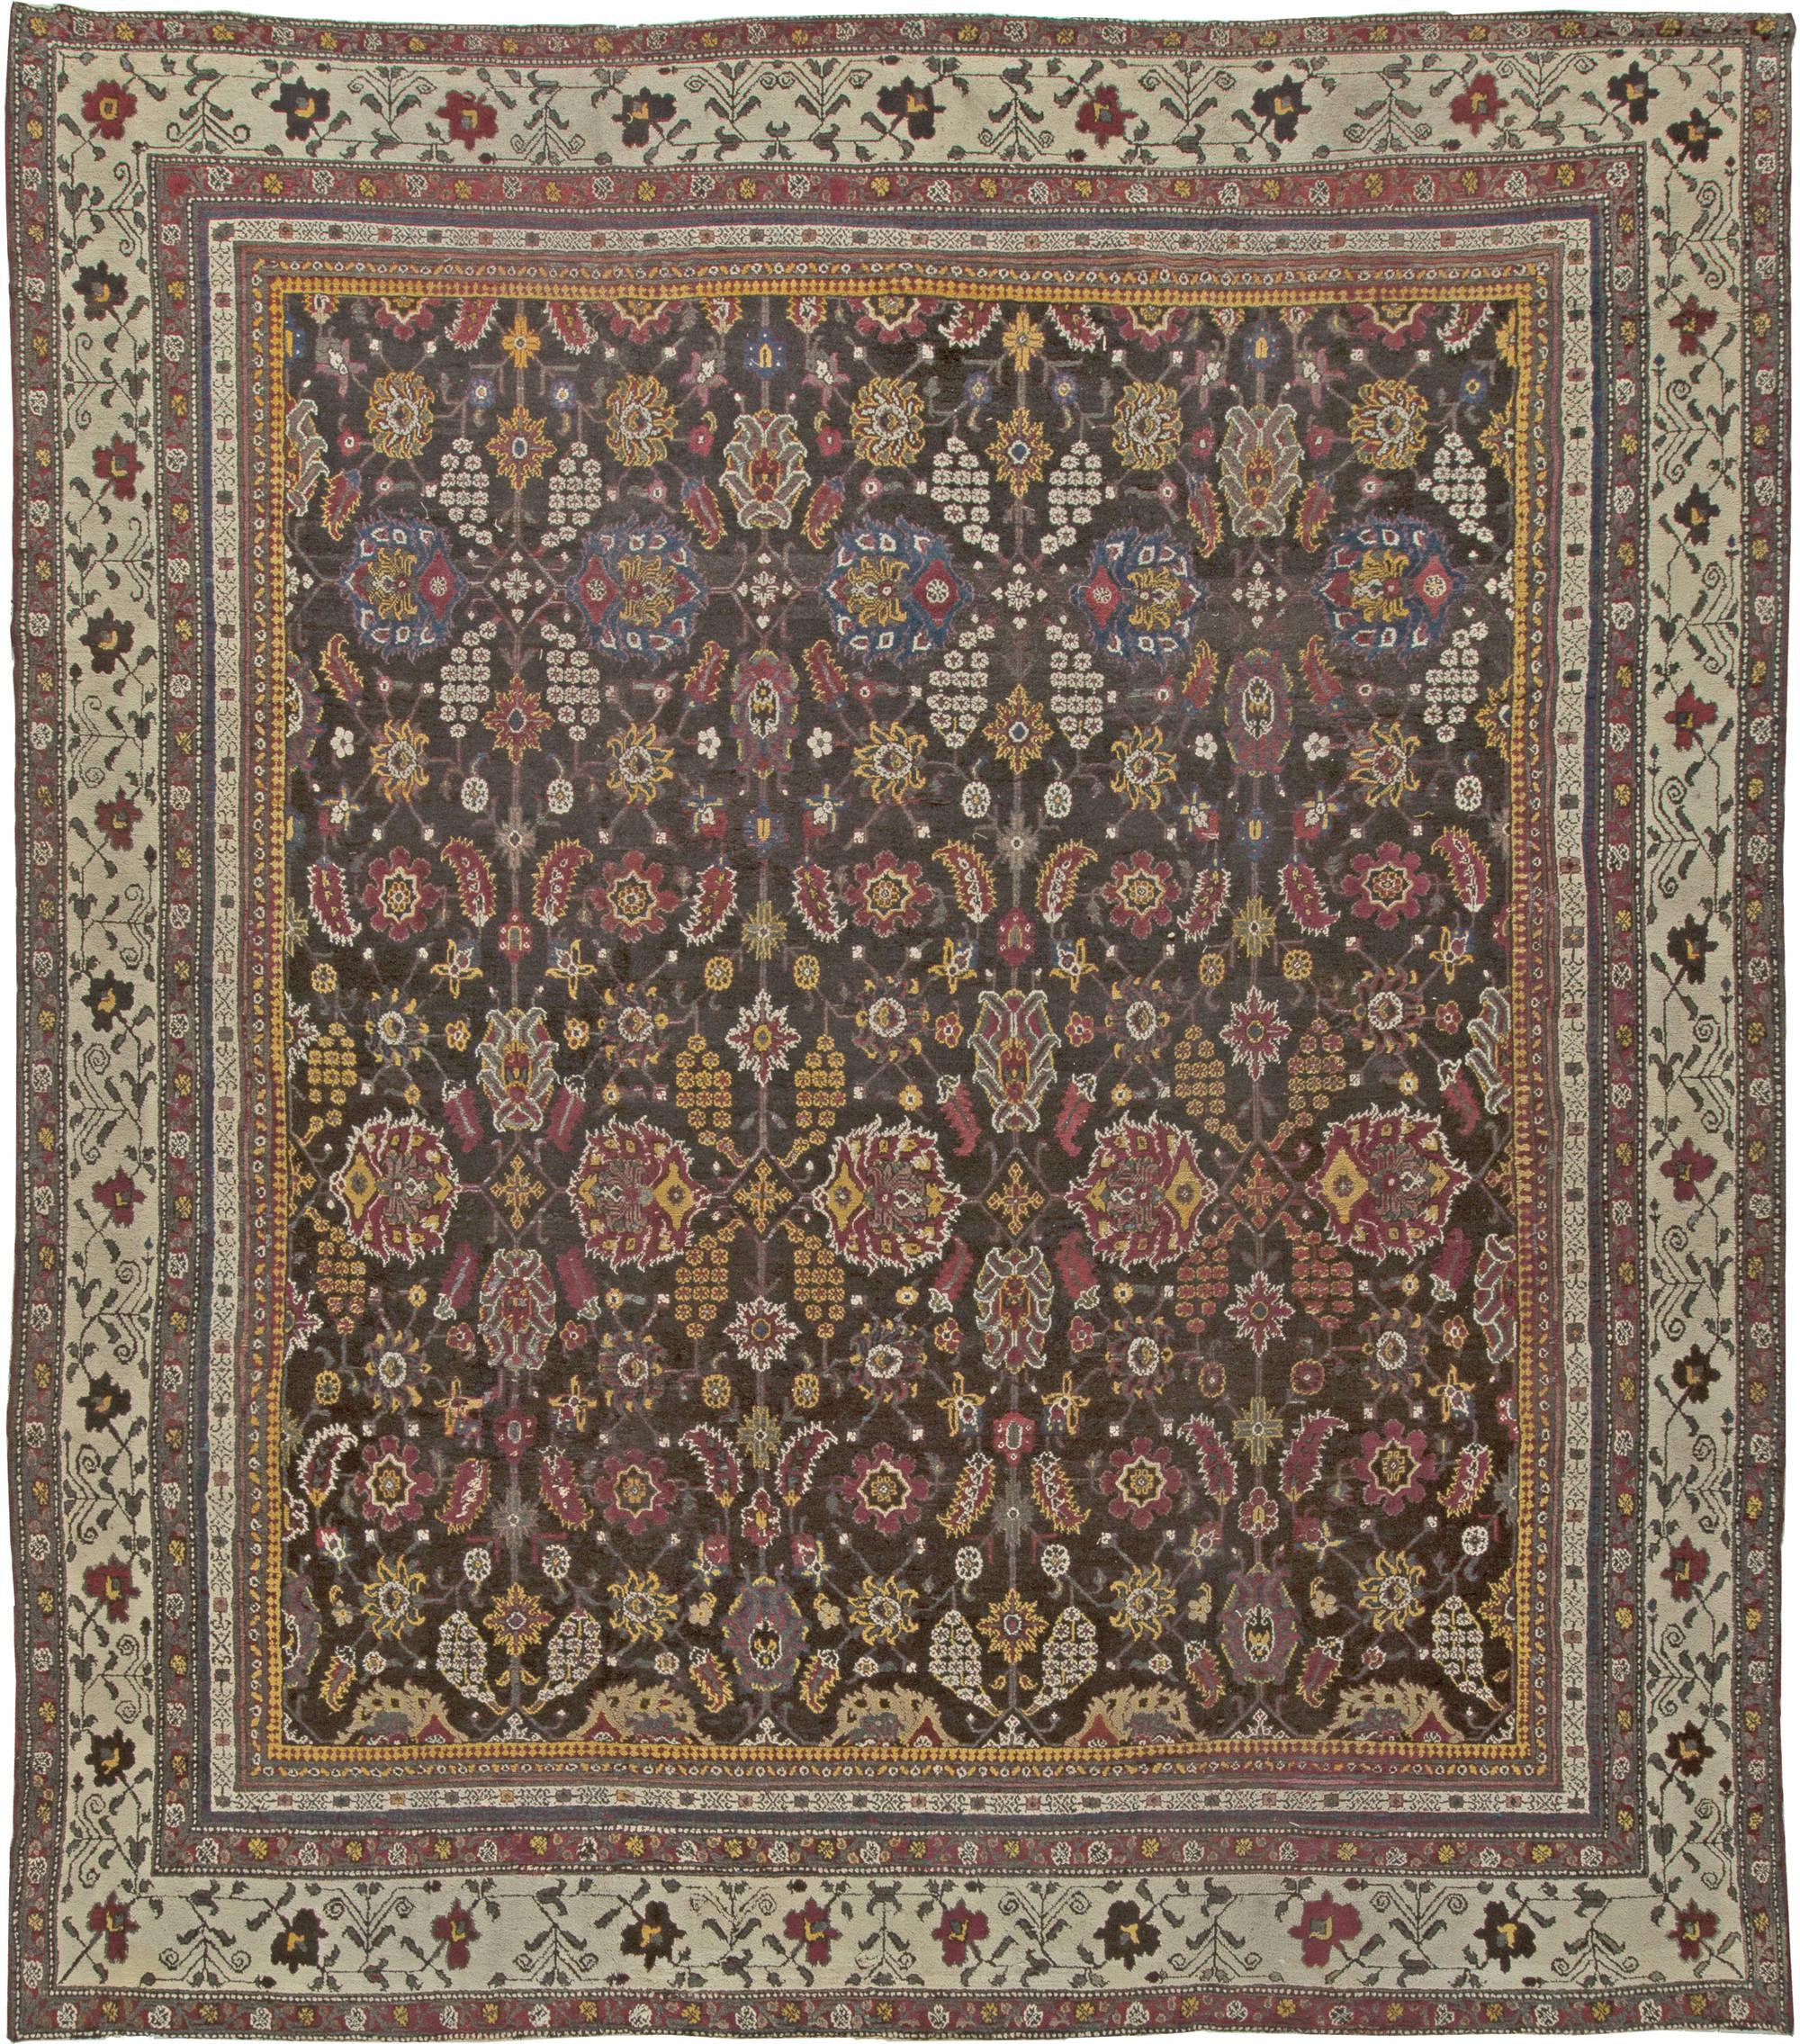 Vintage Indian Agra Carpet Bb5556 By Dlb